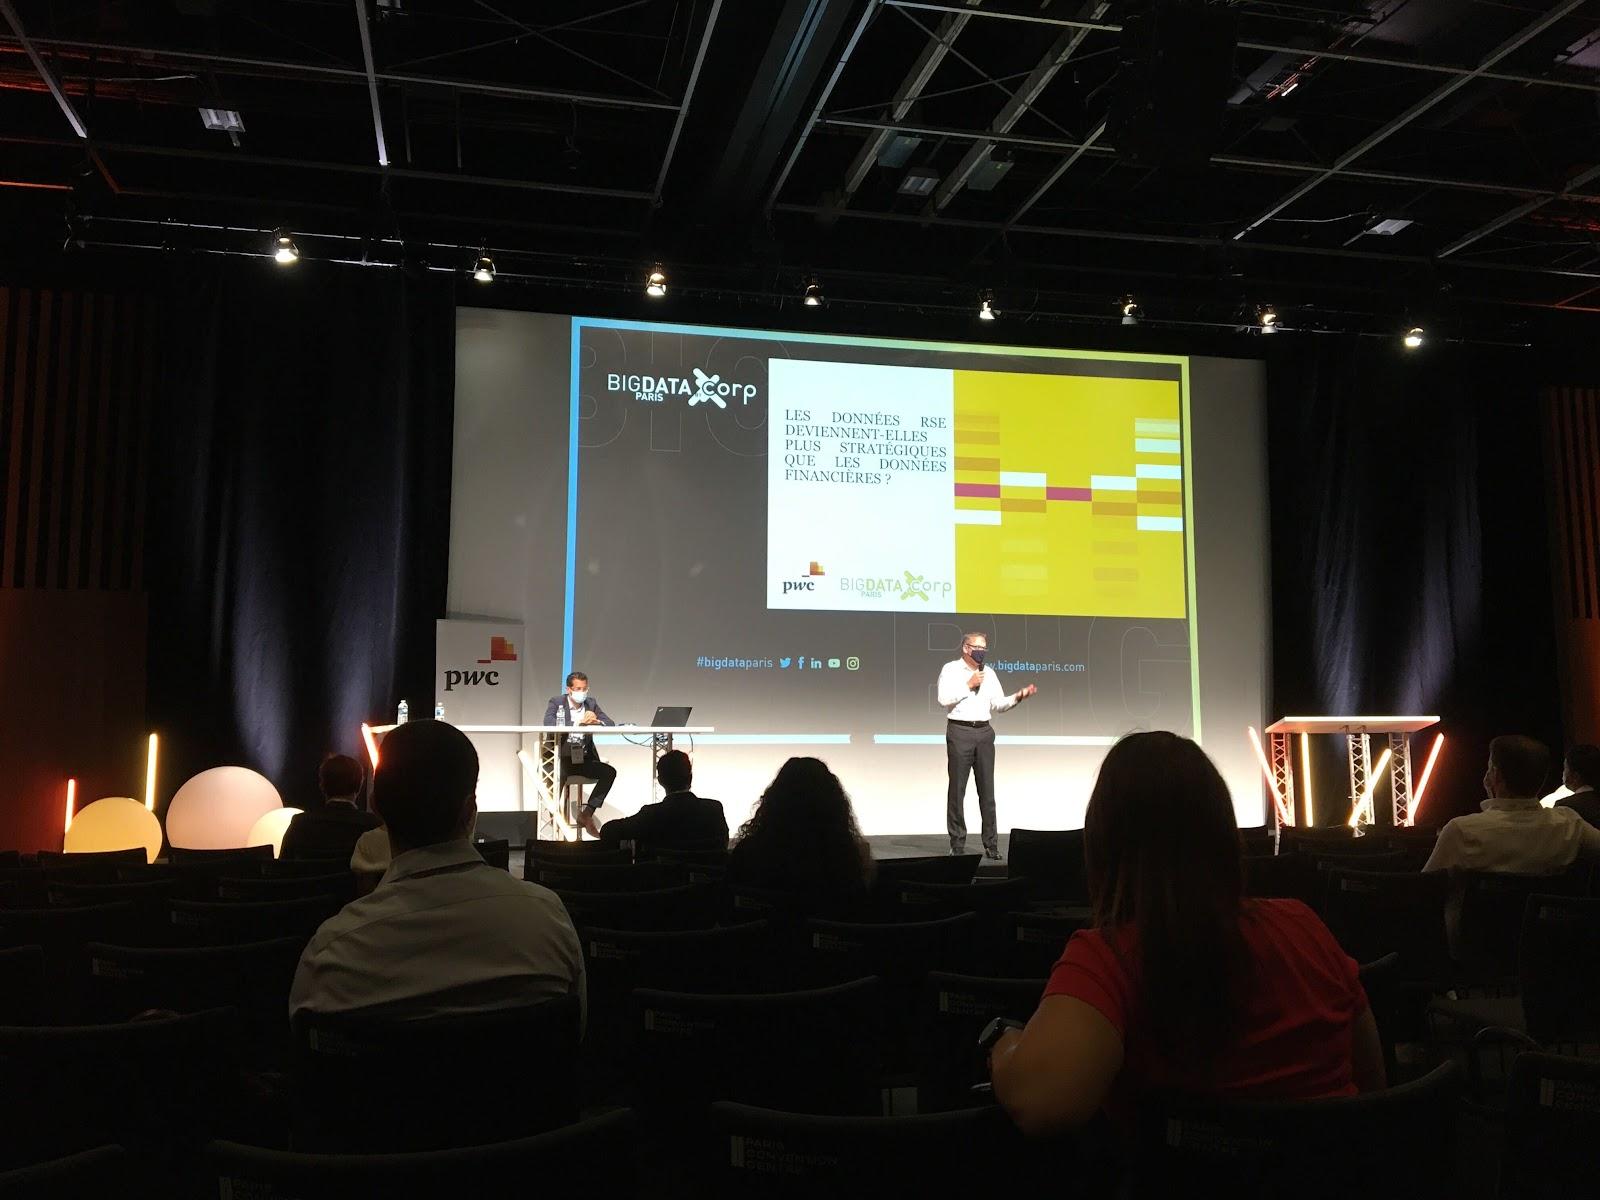 Conférence Paris BIg Data 2020